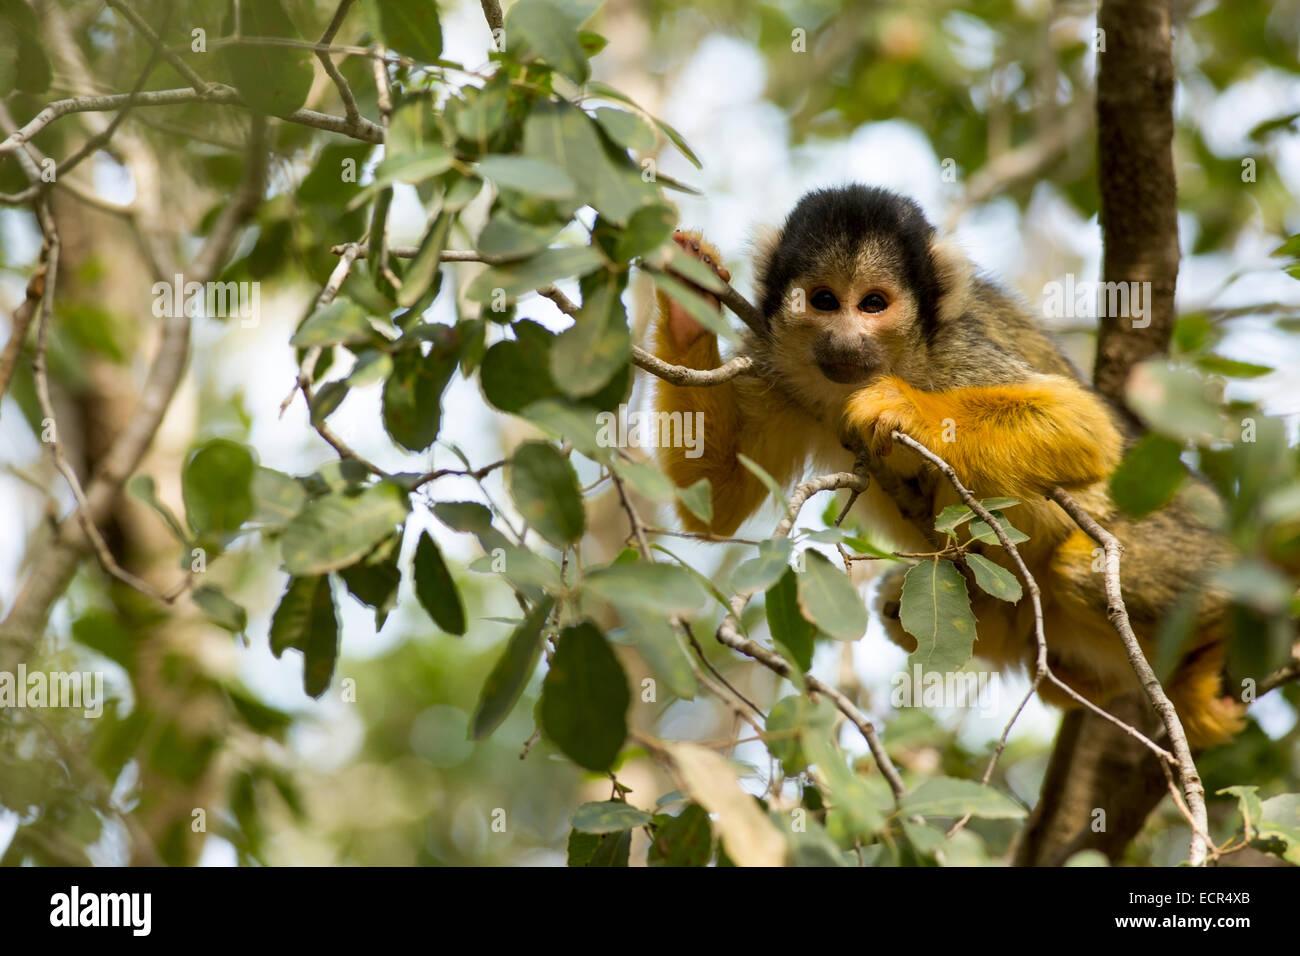 Squirrel monkeys in trees - photo#44